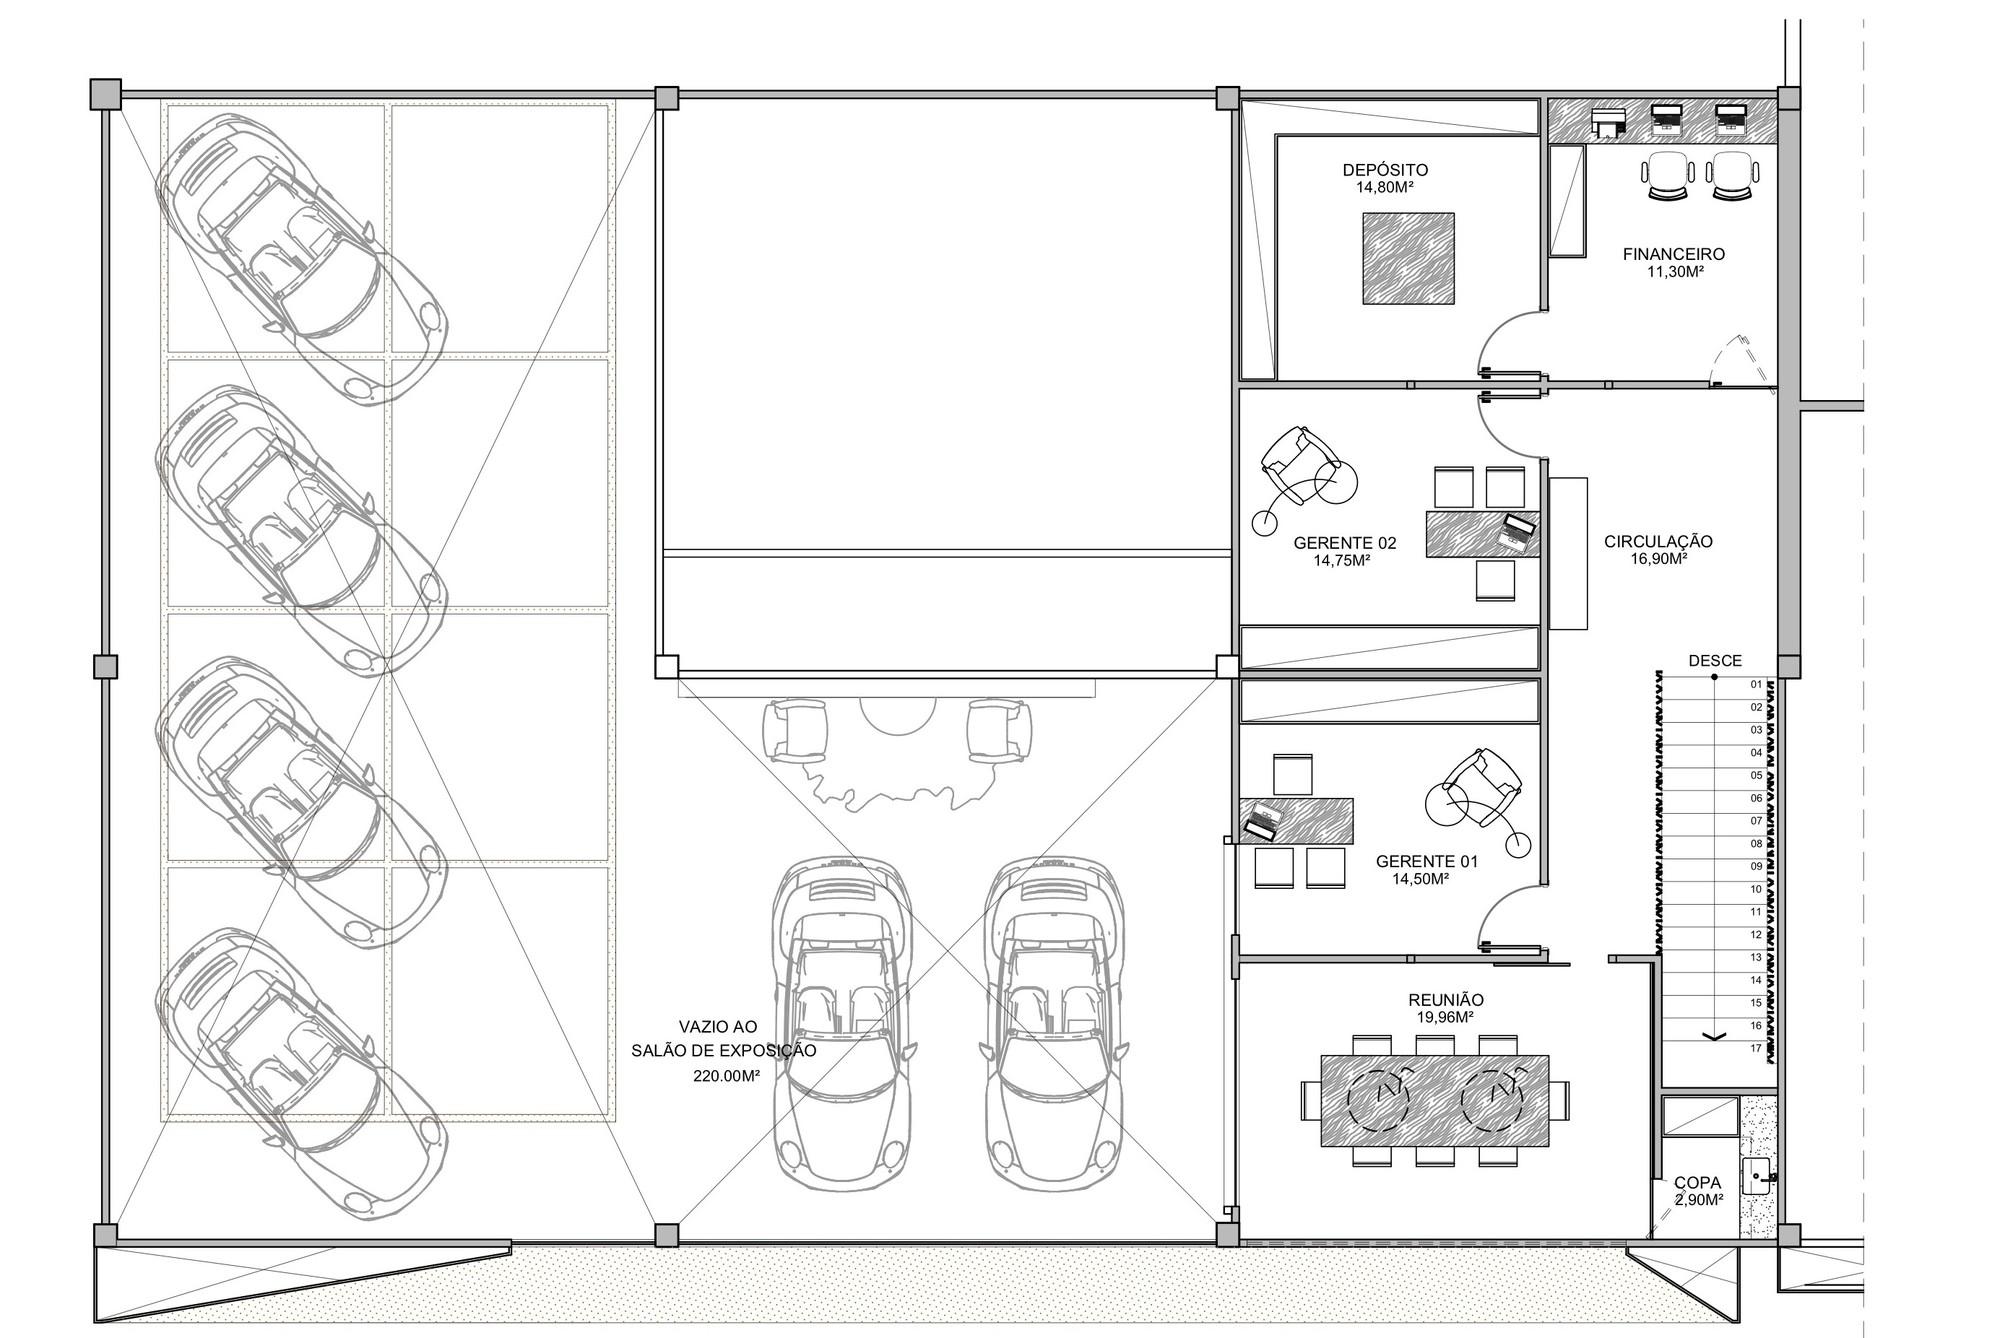 Gallery of showroom eurobike porsche 1 1 arquitetura for Floor plan furniture store